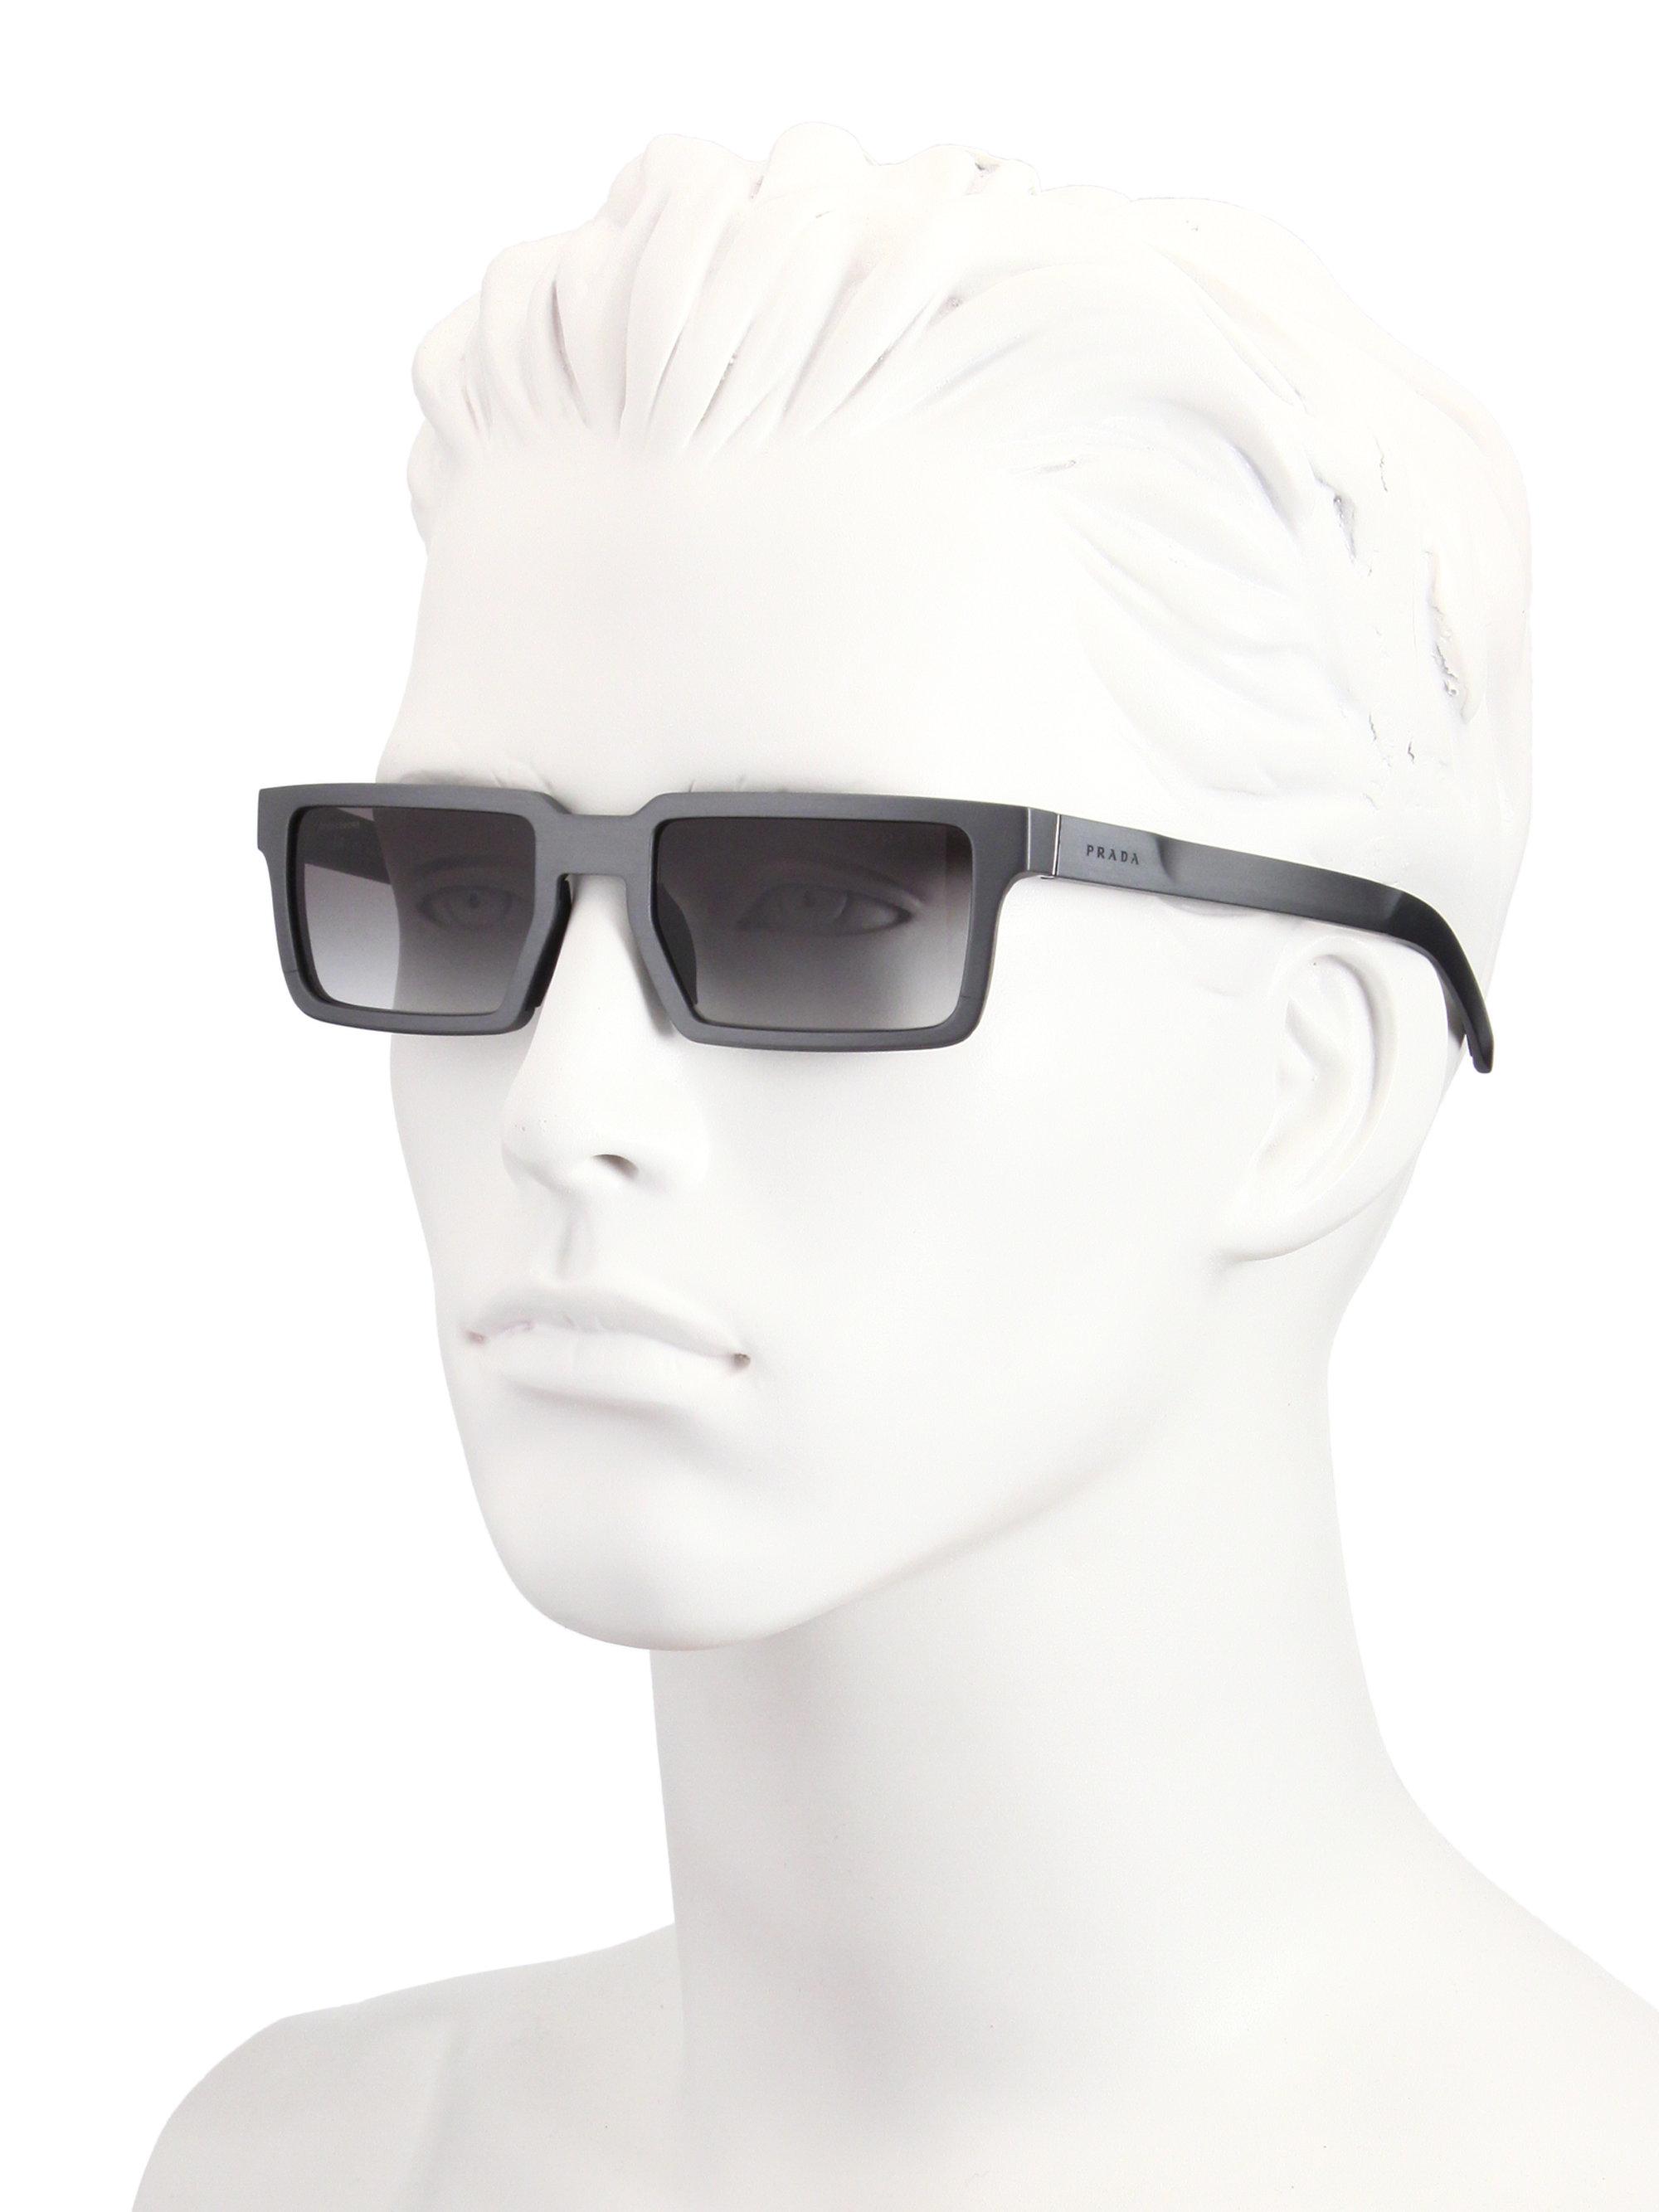 7f506e66946 ... discount code for lyst prada 51mm rectangle aluminum sunglasses in gray  for men 65ecf 6c5c0